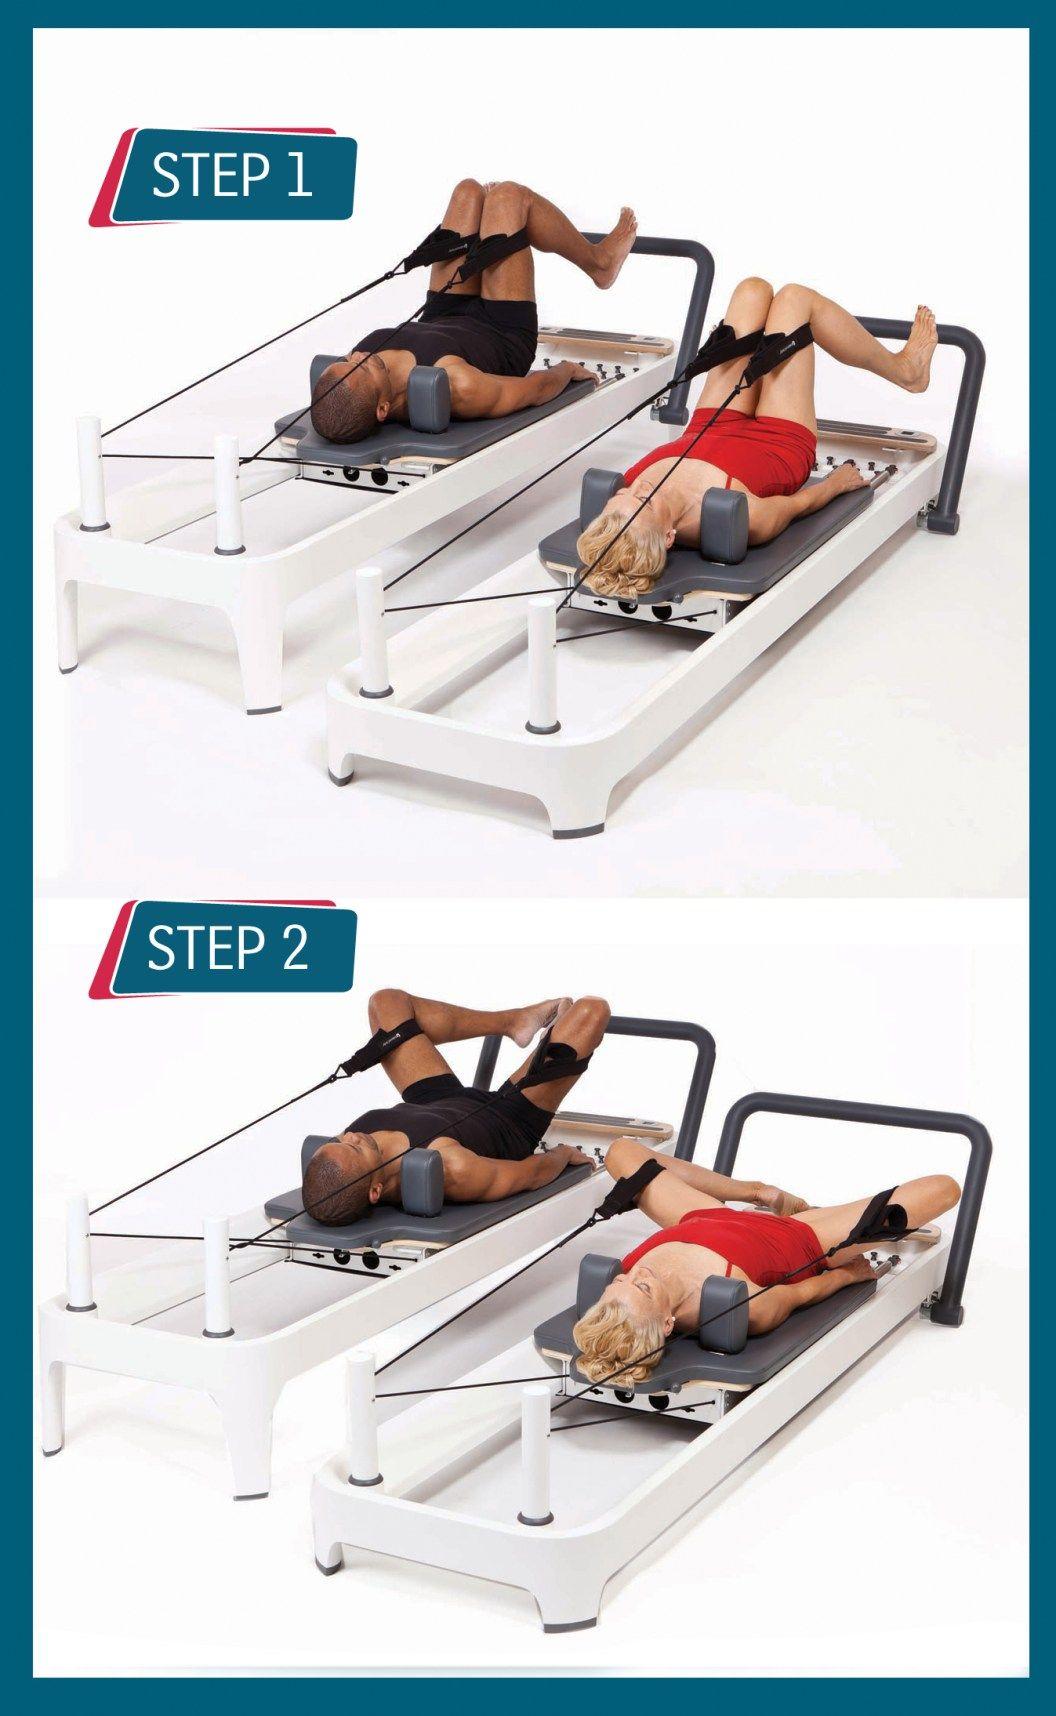 Get Over The Slump Pilates Reformer Exercises Pilates Barre Workout Pilates Reformer